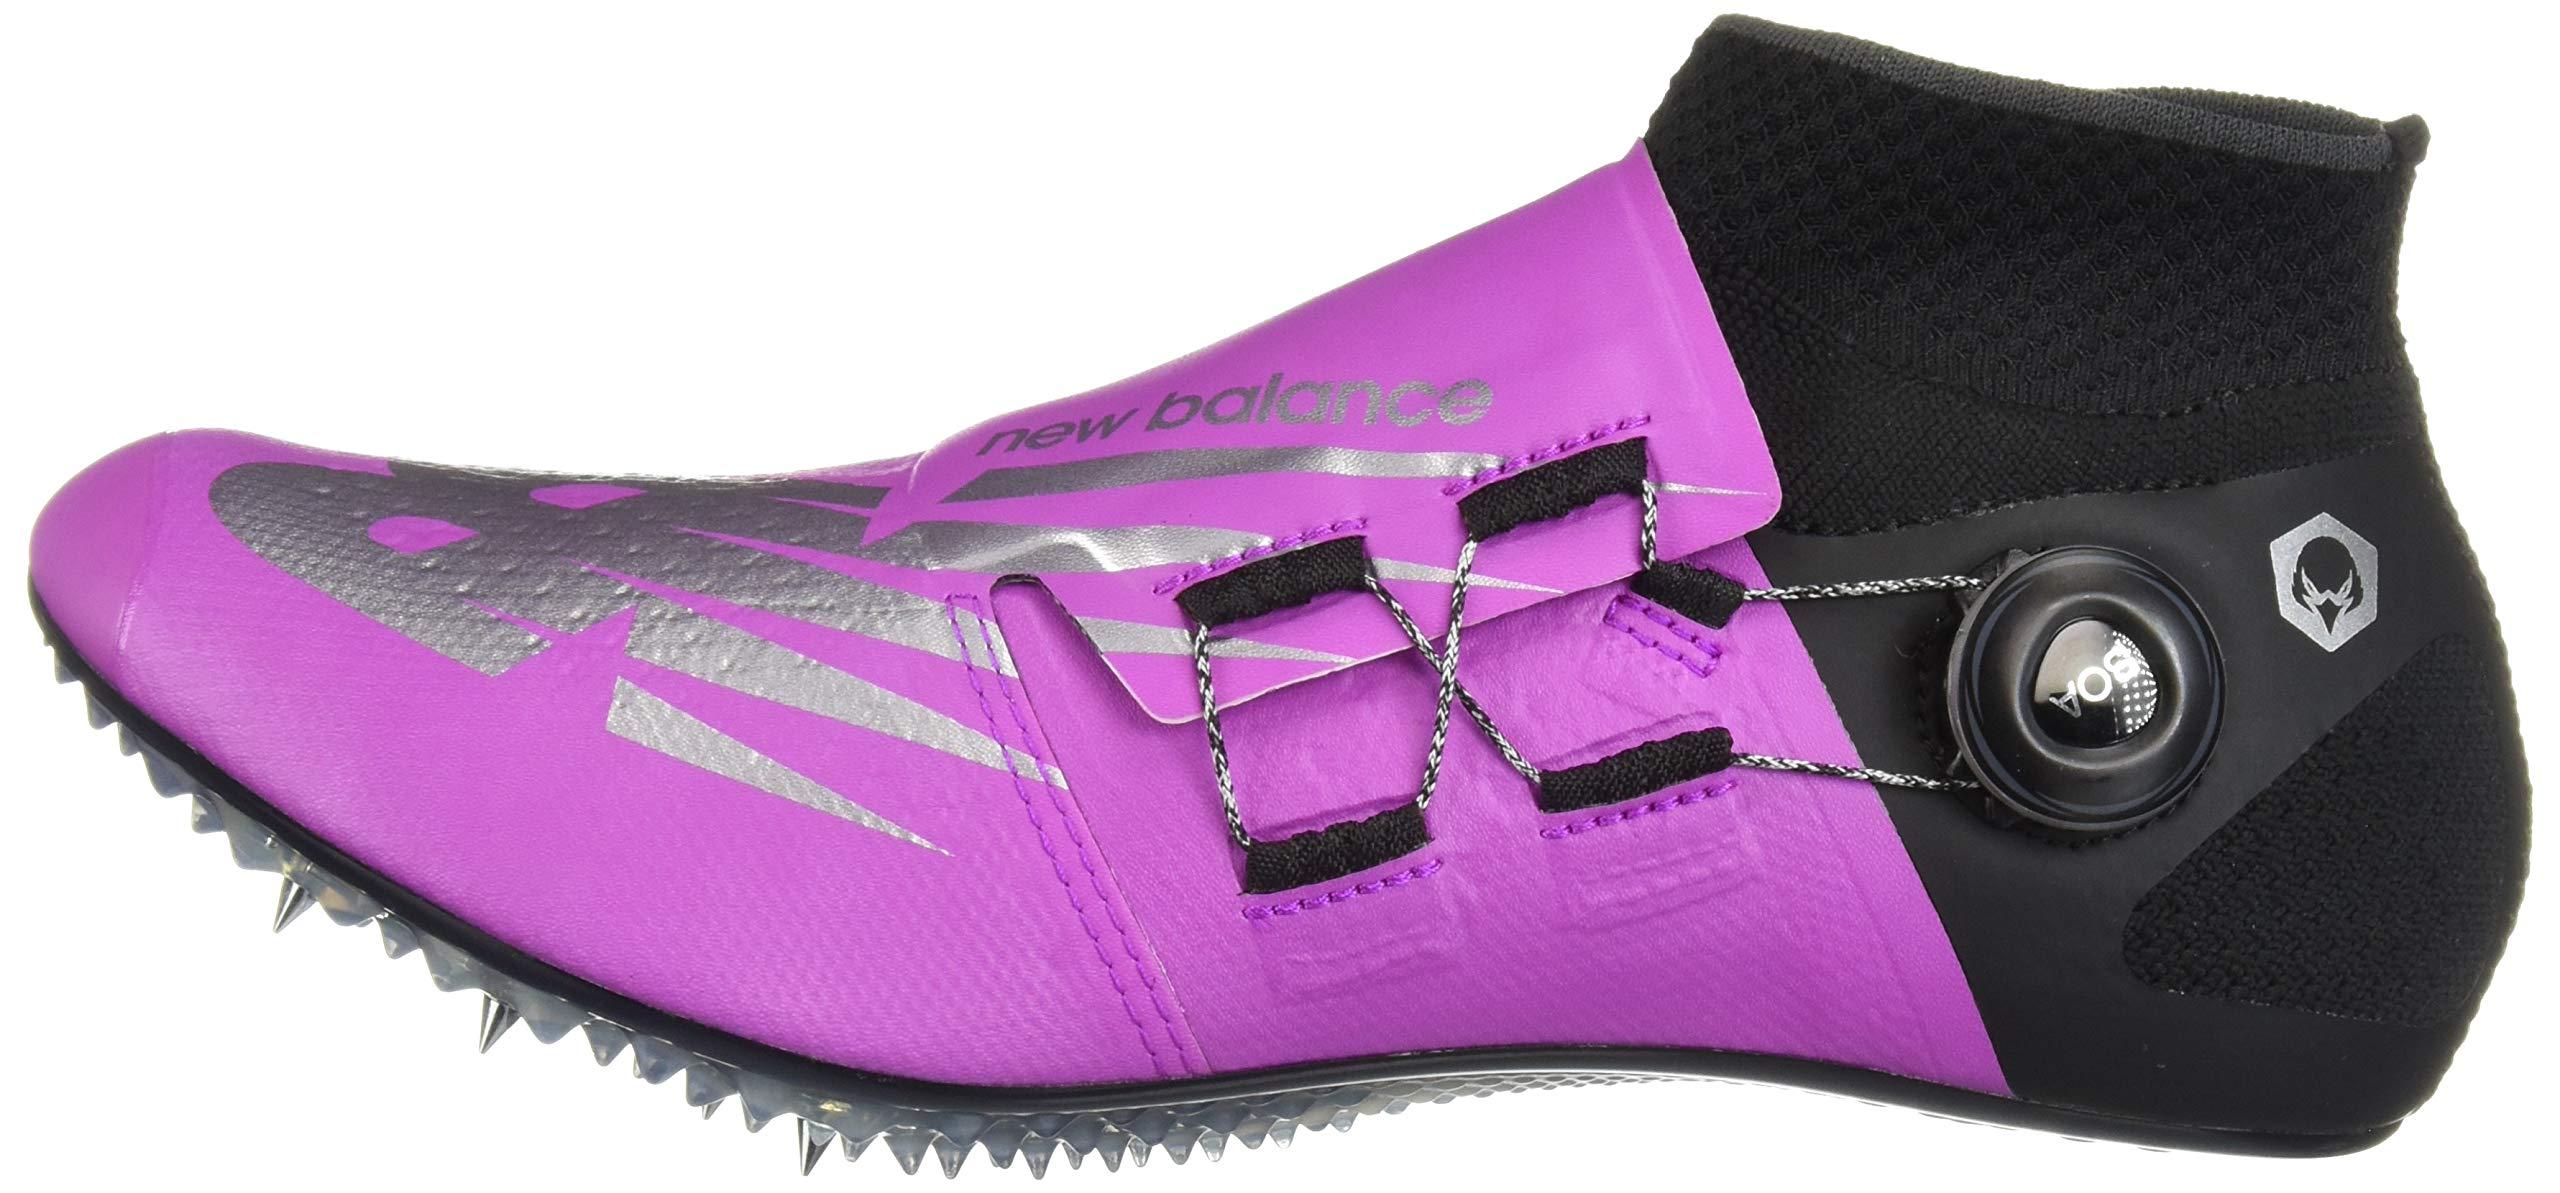 New Balance Men's Sigma Harmony Vazee Track Shoe Voltage Violet/Black 4.5 D US by New Balance (Image #5)